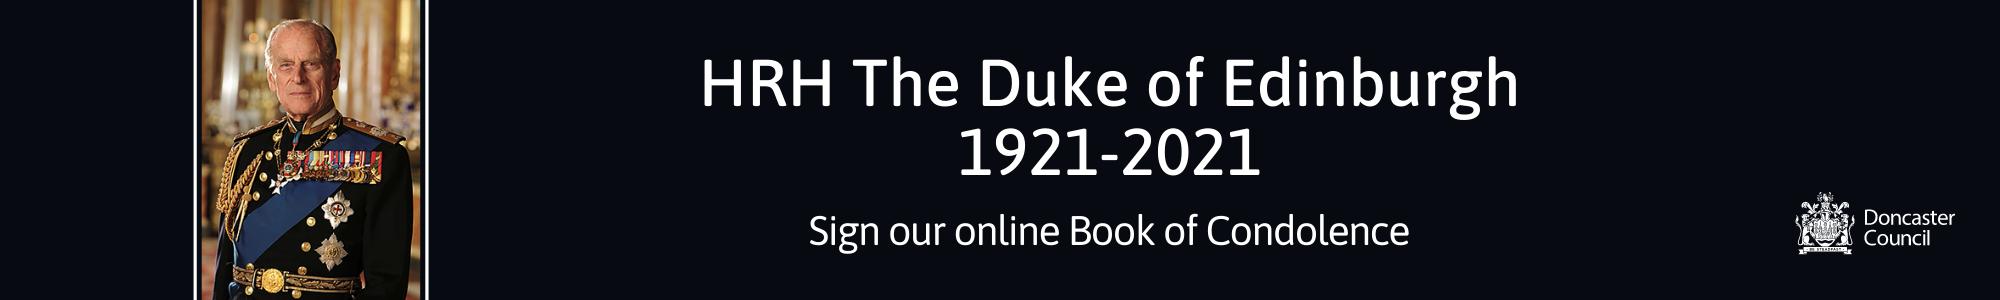 HRH The Duke of Edinburgh condolence book